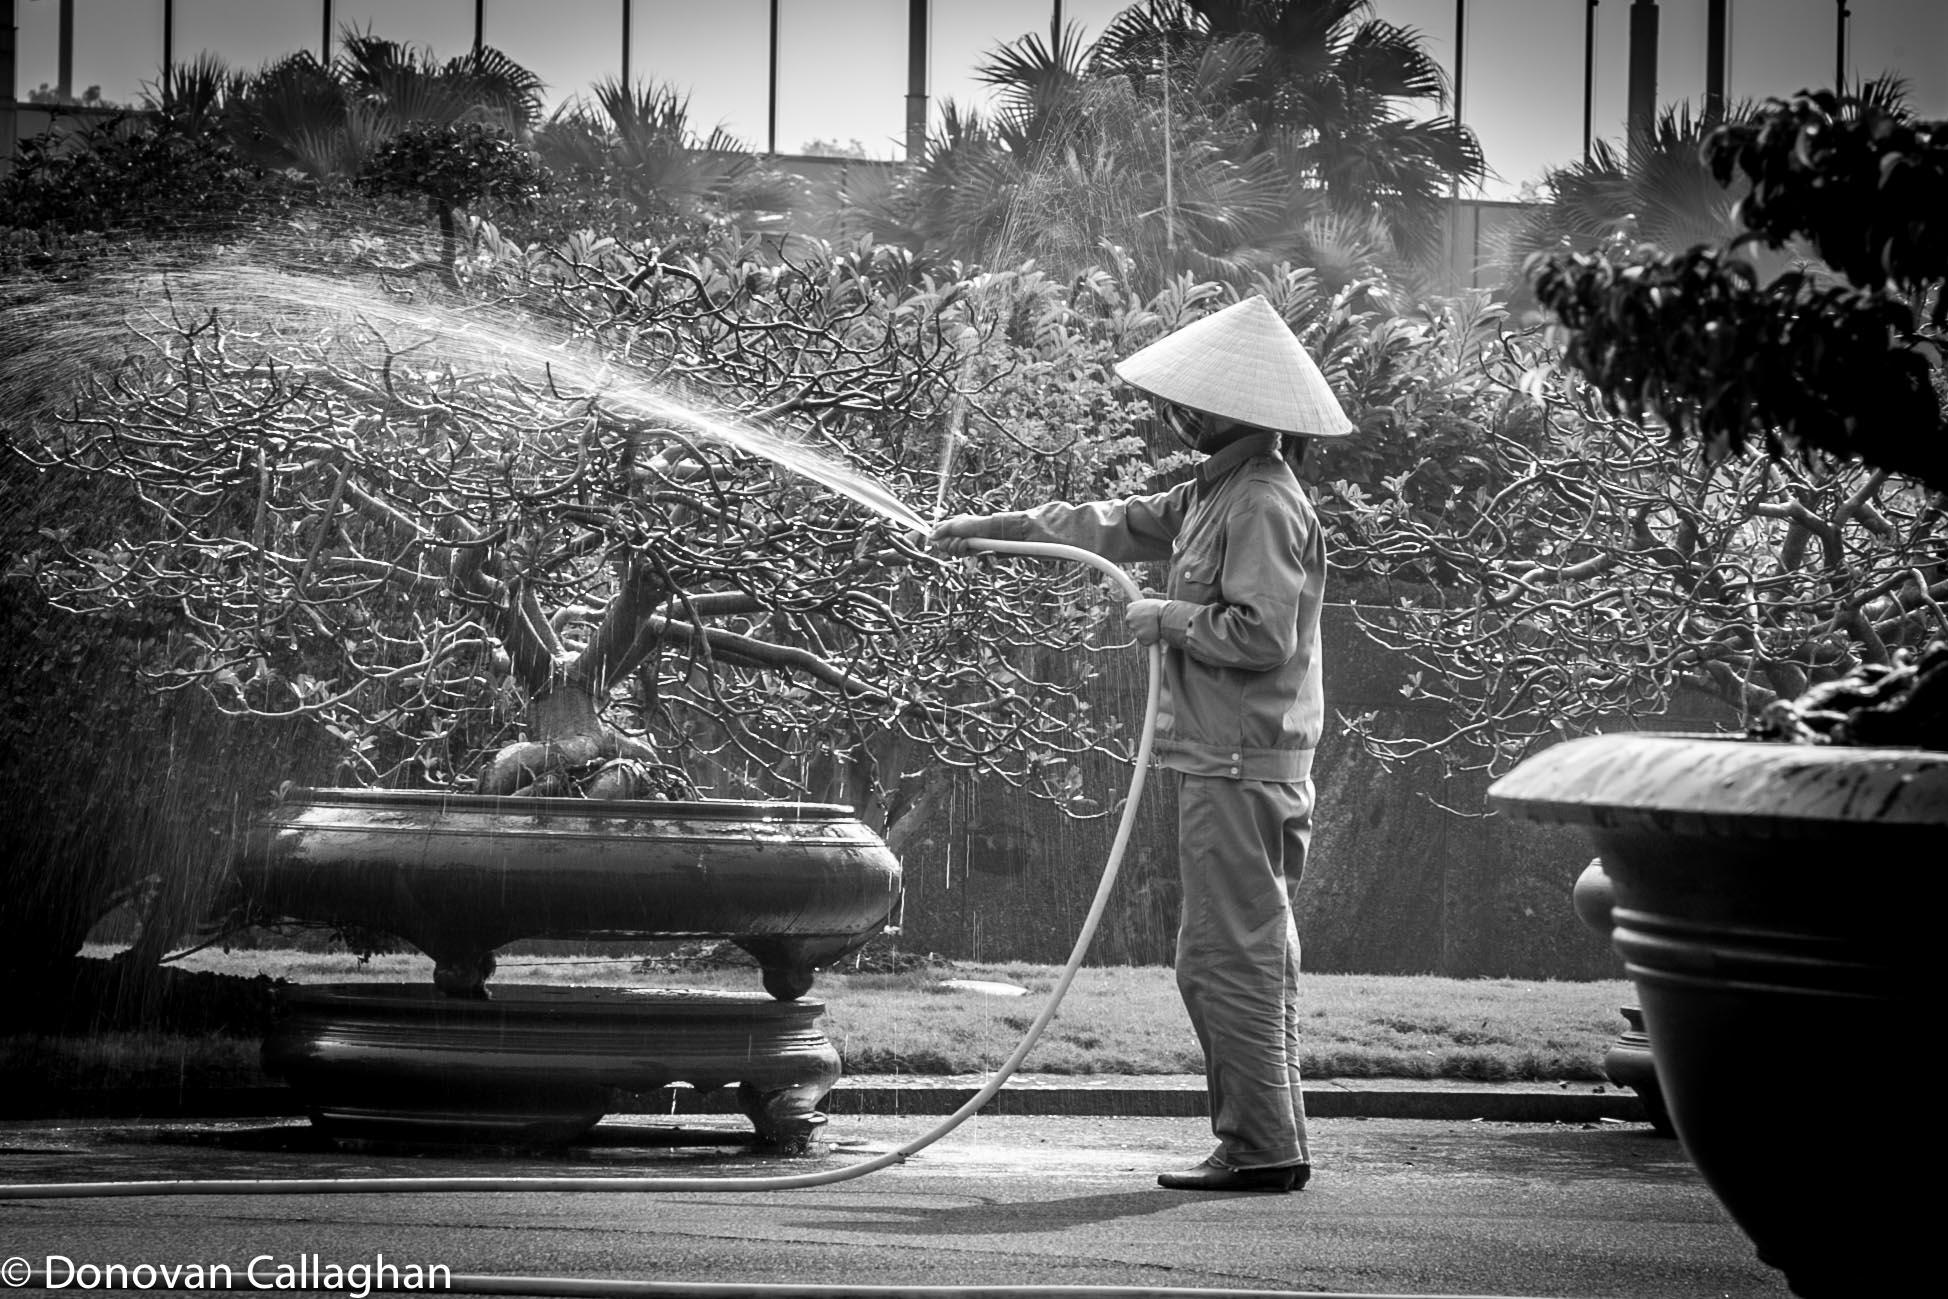 Gardner the Ho Chi Minh Mausoleum gardens, Vietnam